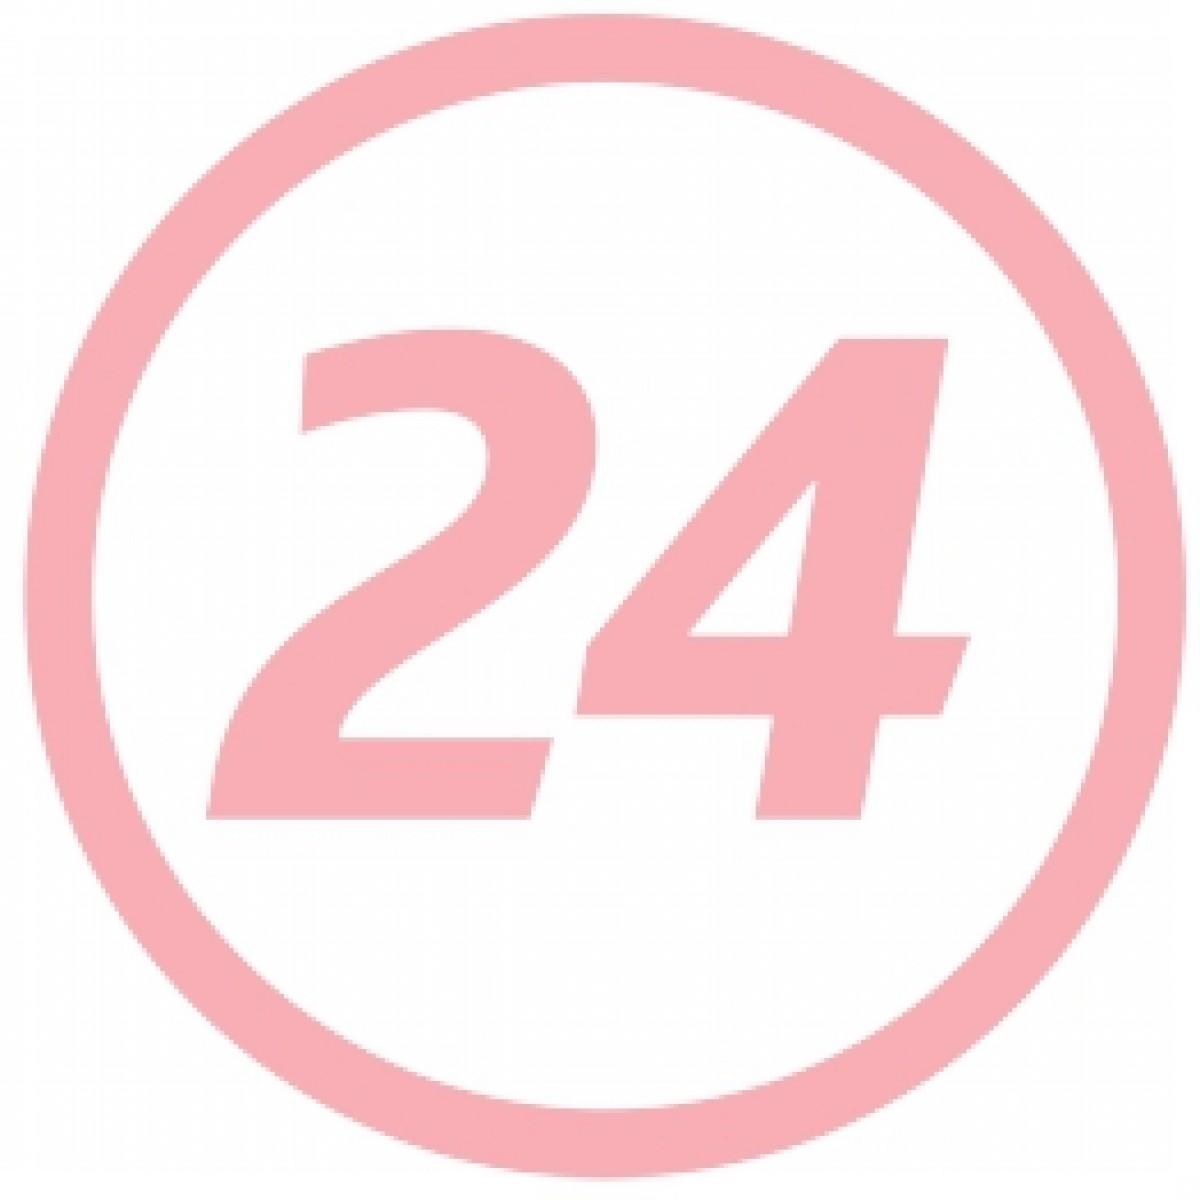 Hartmann Molicare Pad 4 Picaturi Tampoane pentru Incontinenta Usoara, Tampoane, 28buc